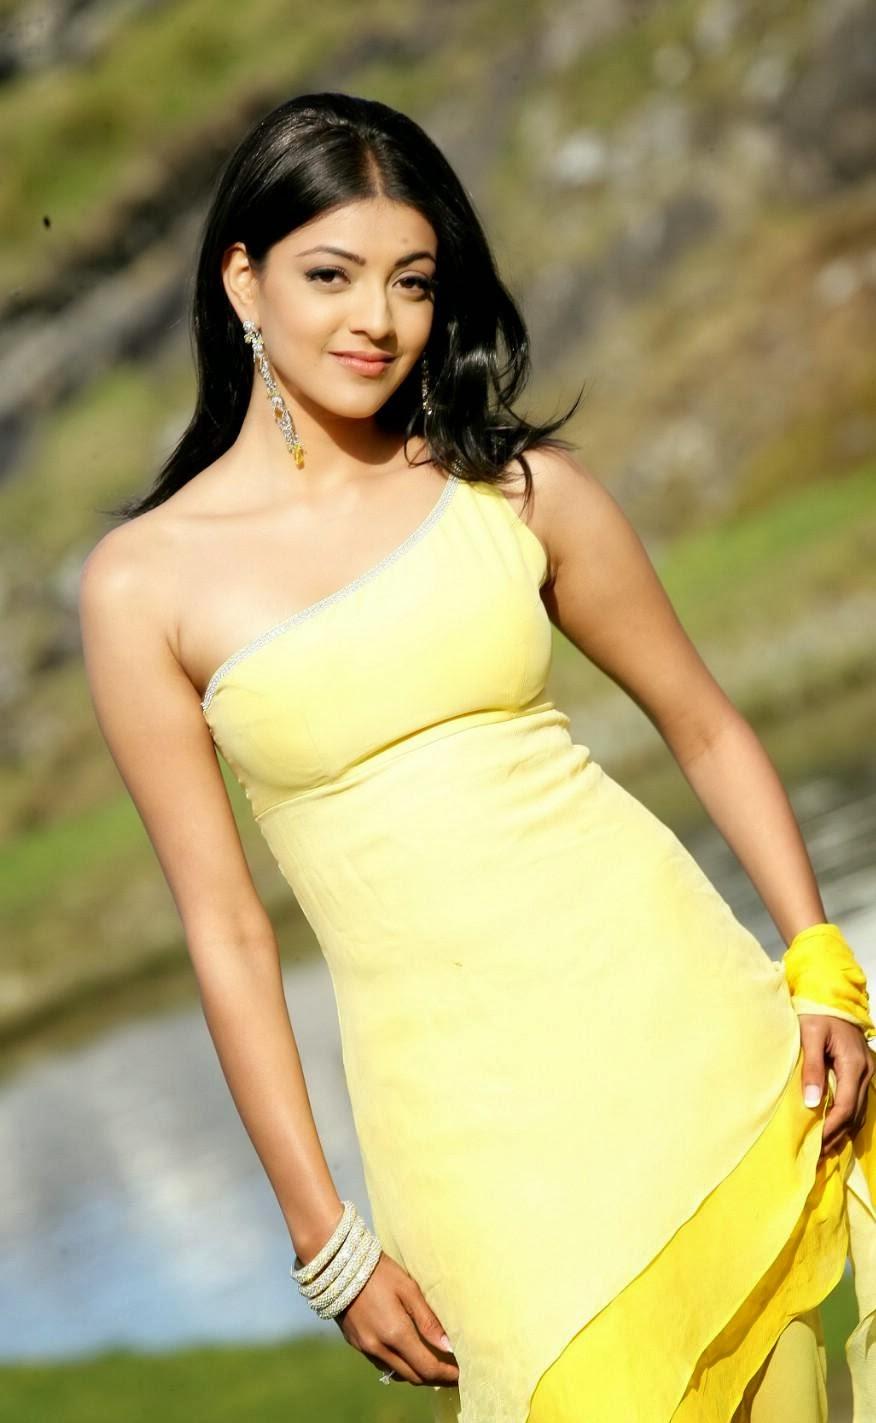 Kajal+Agarwal+Photos+in+Yellow+Dress004